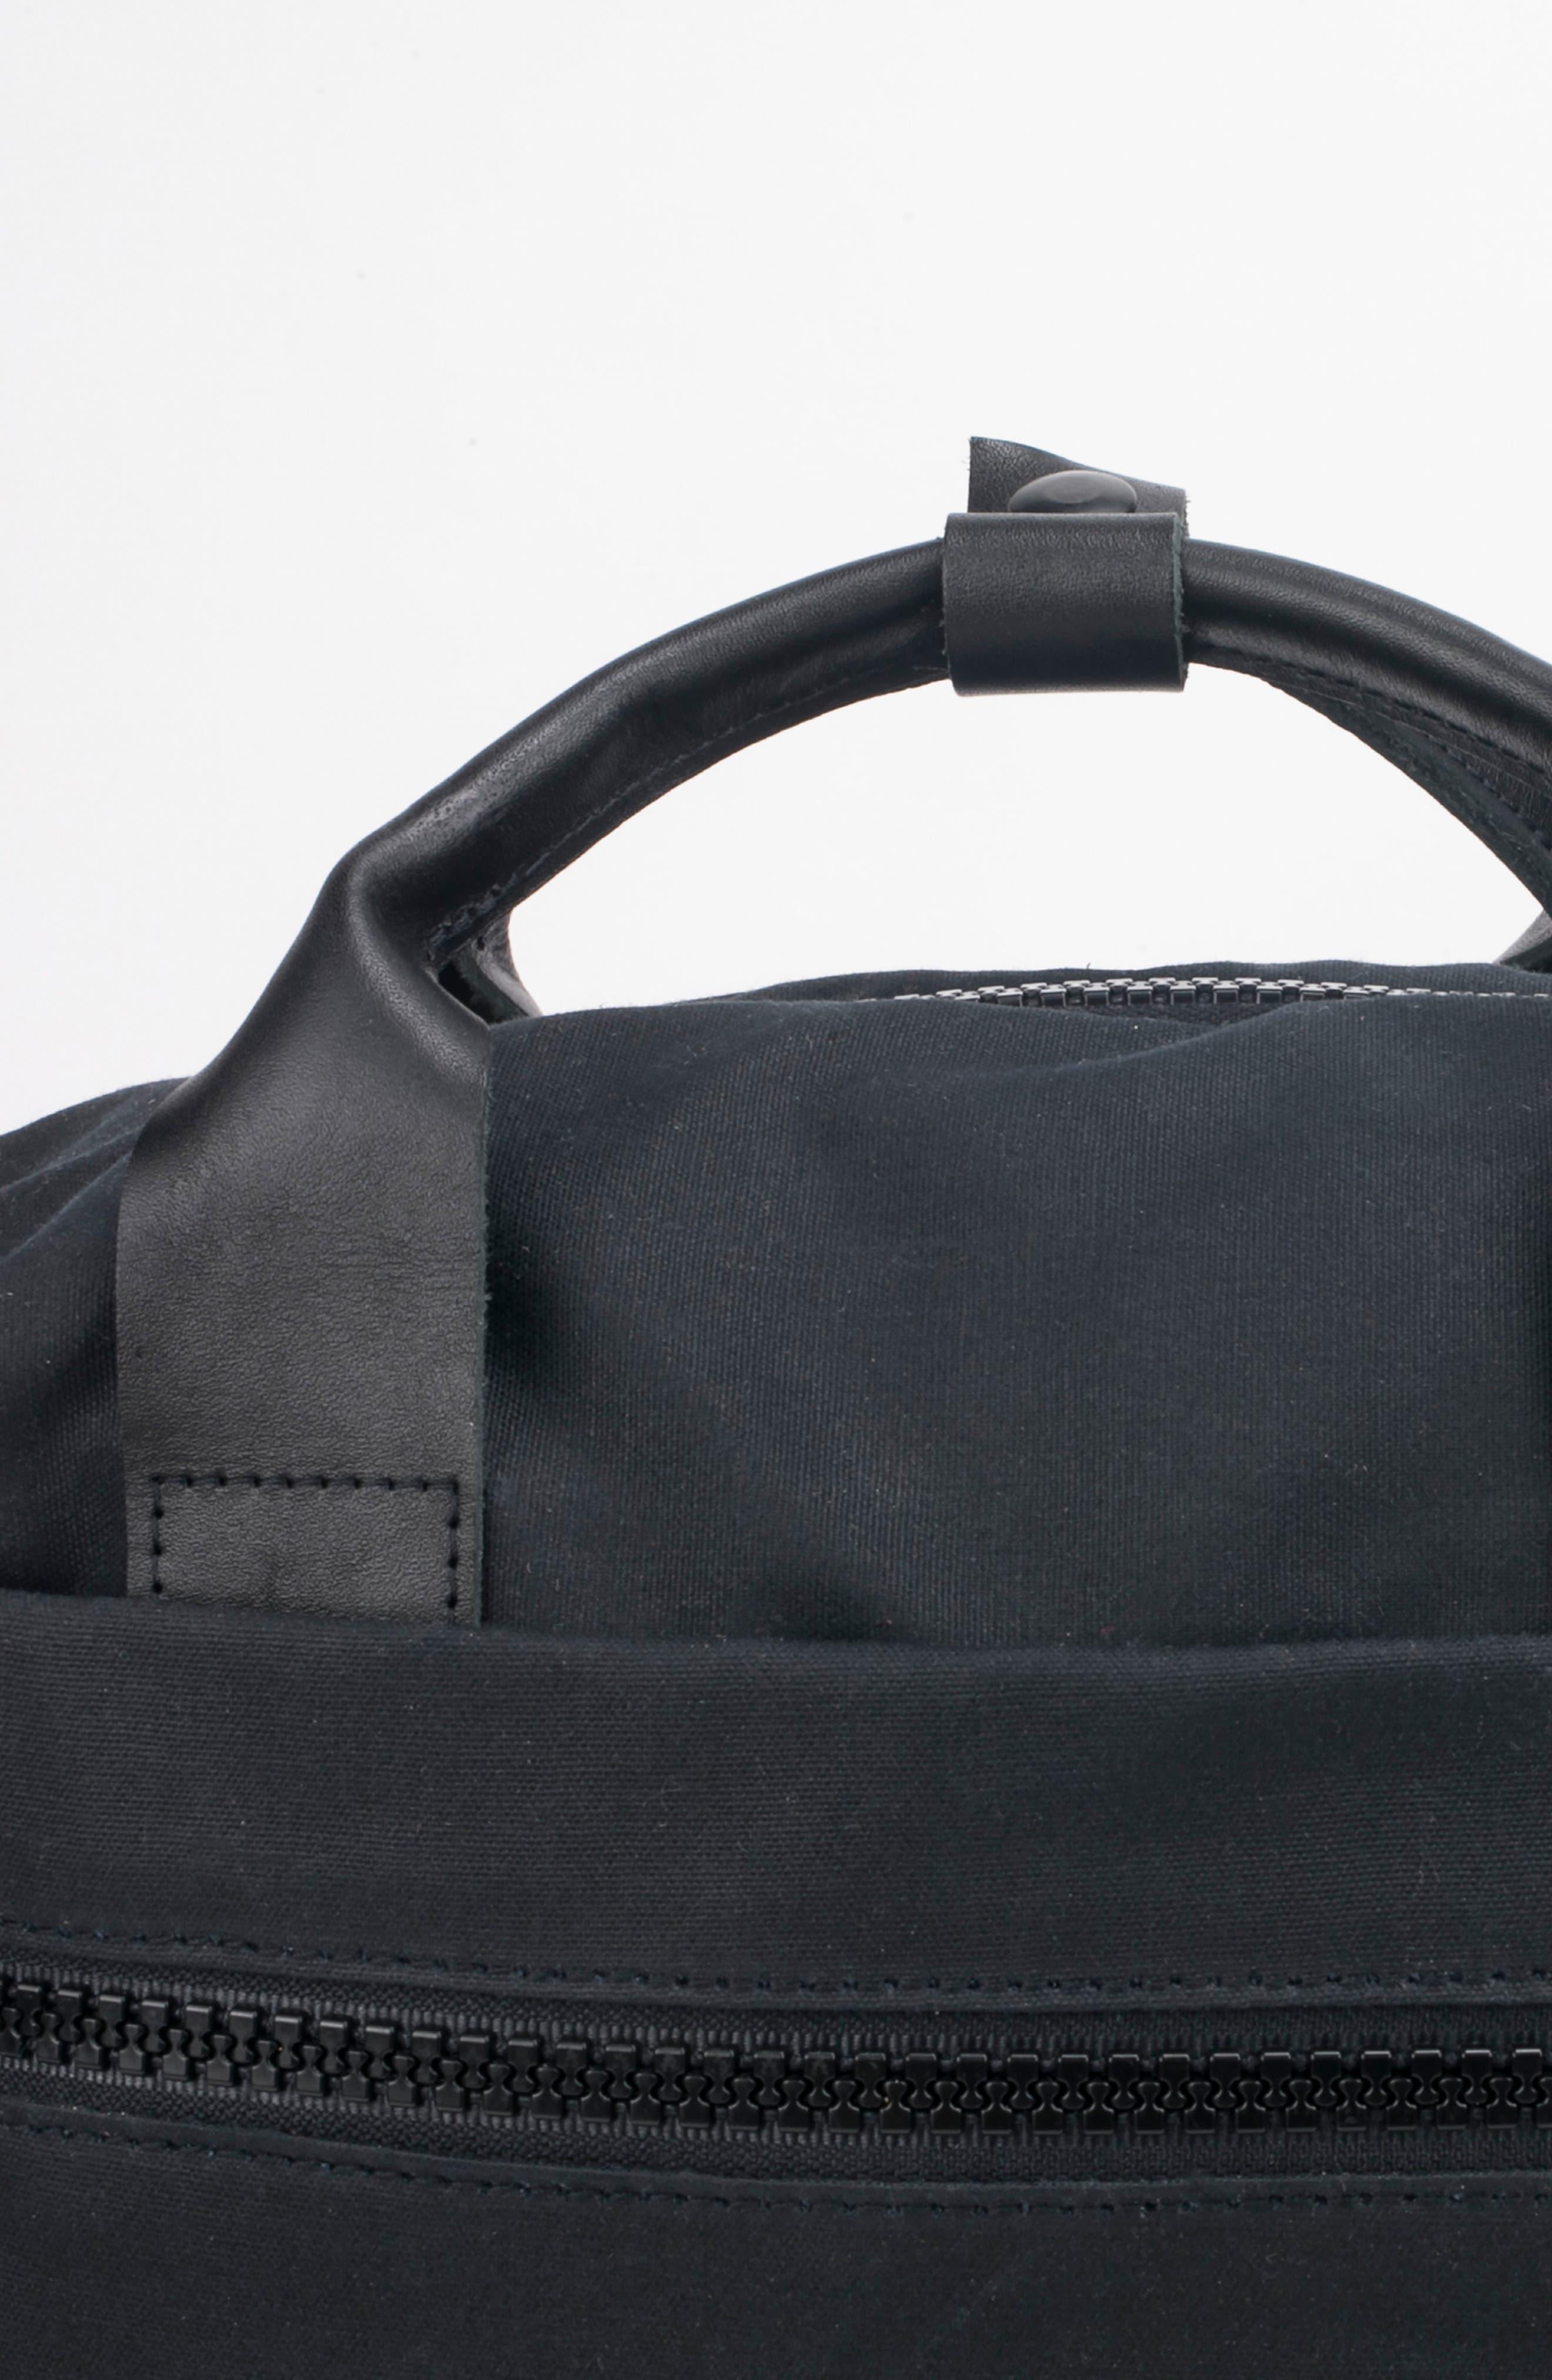 Metro Backpack,                             Alternate thumbnail 5, color,                             BLACK